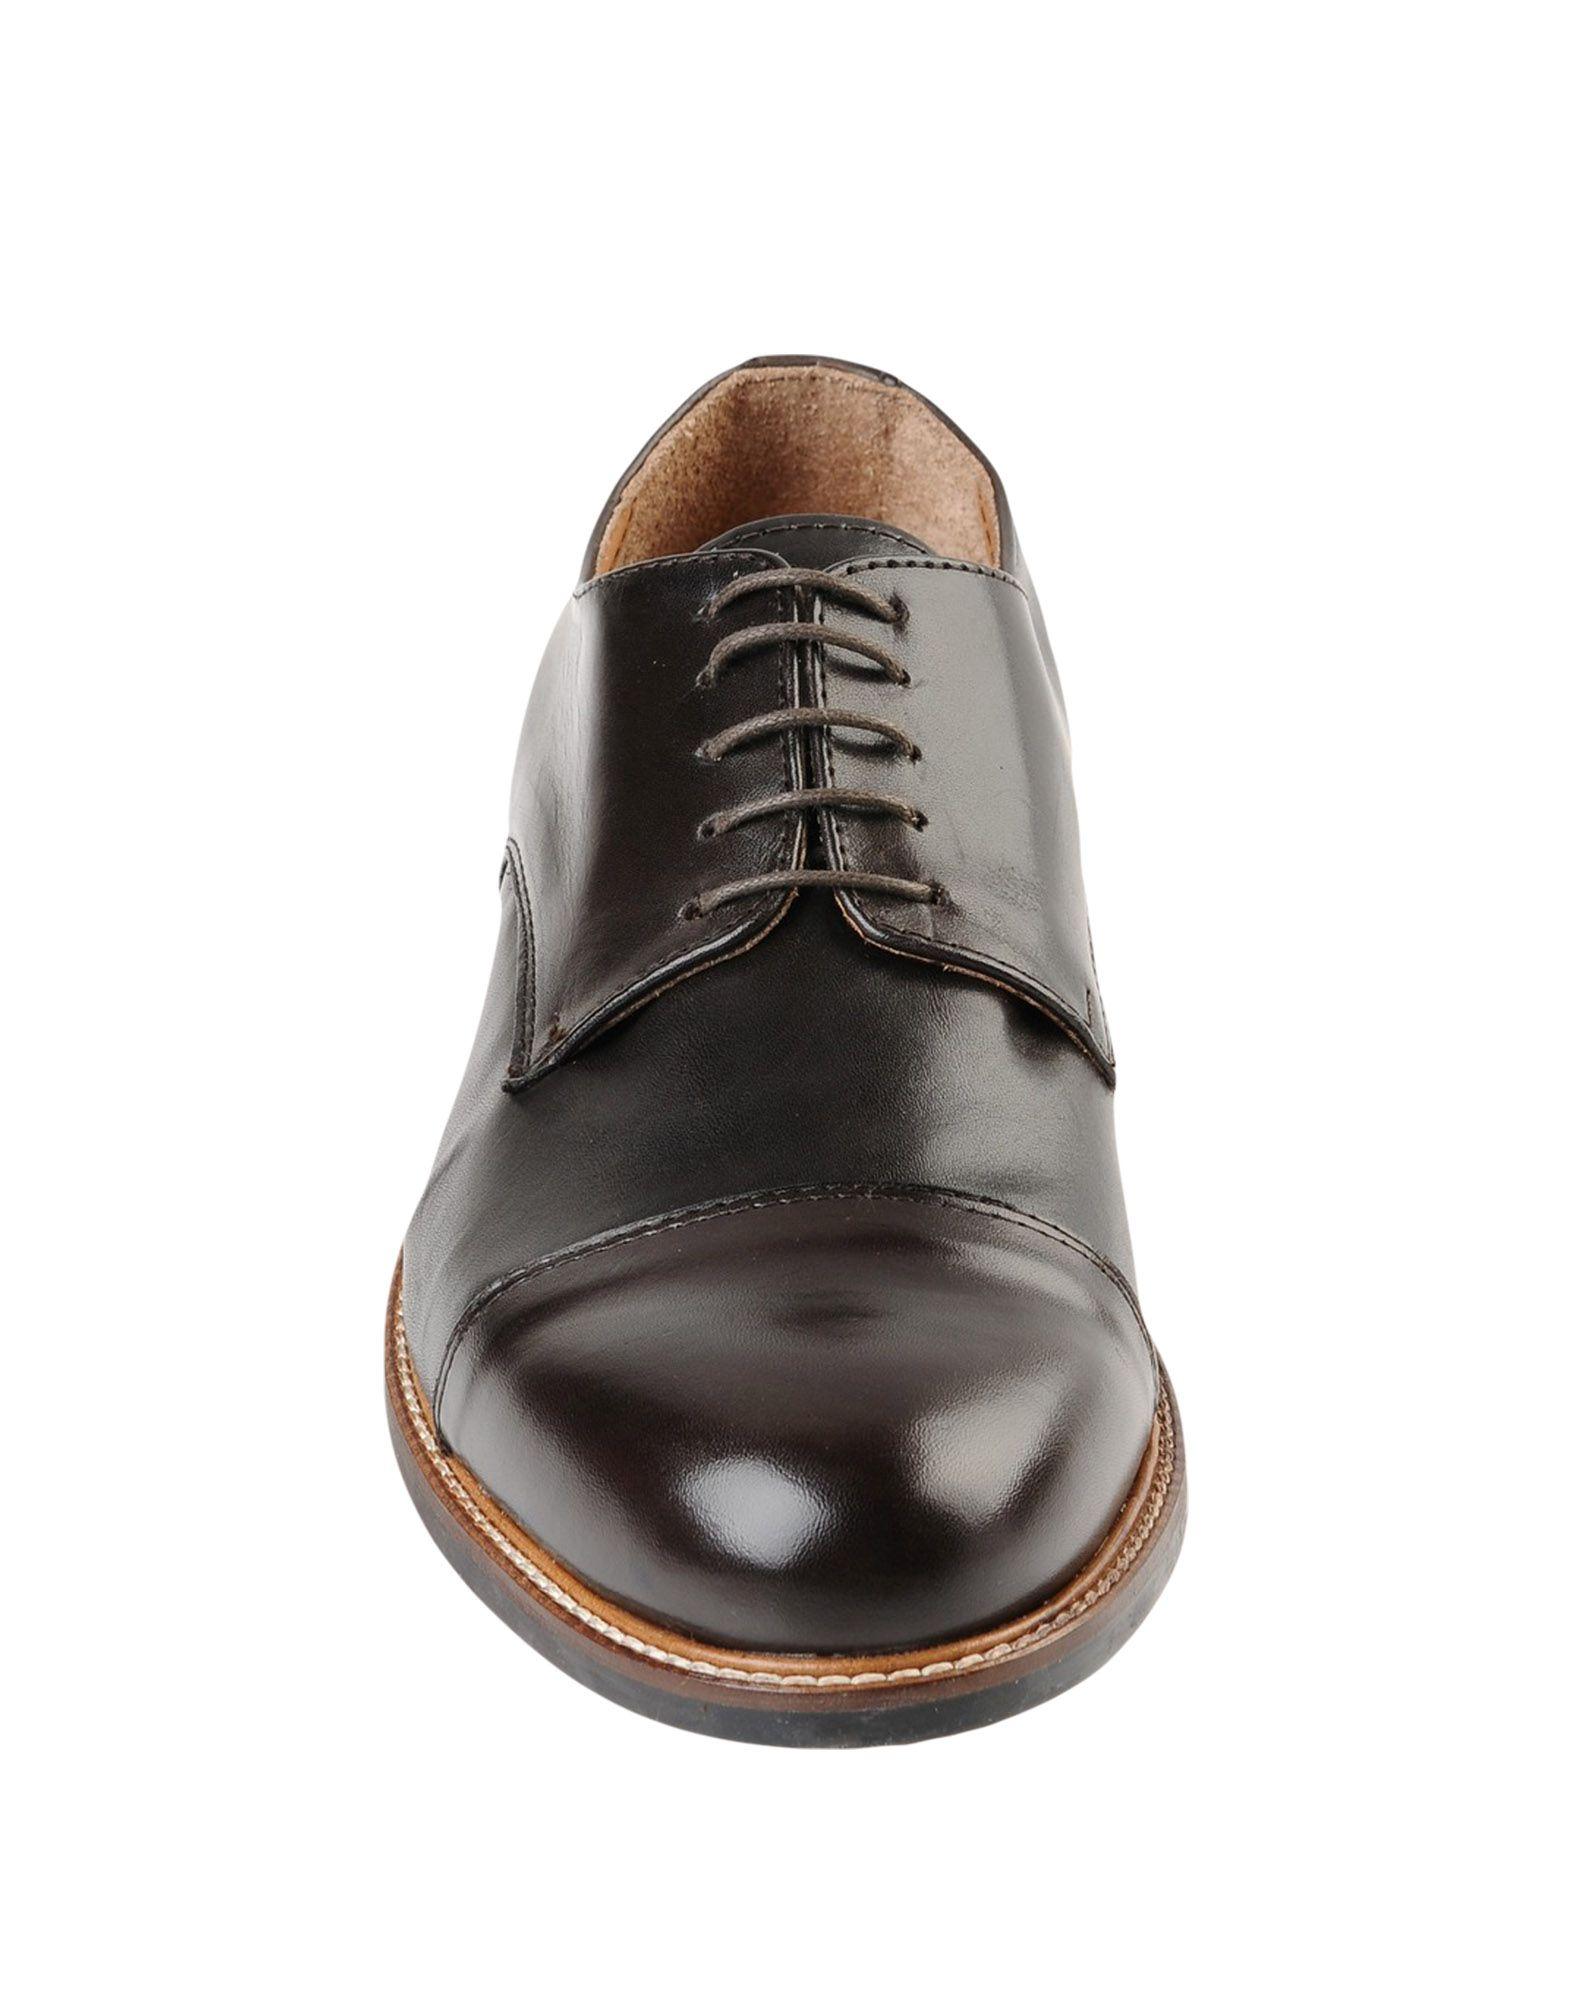 Leonardo Principi Principi Principi Schnürschuhe Herren  11541759WP Neue Schuhe edf3e9